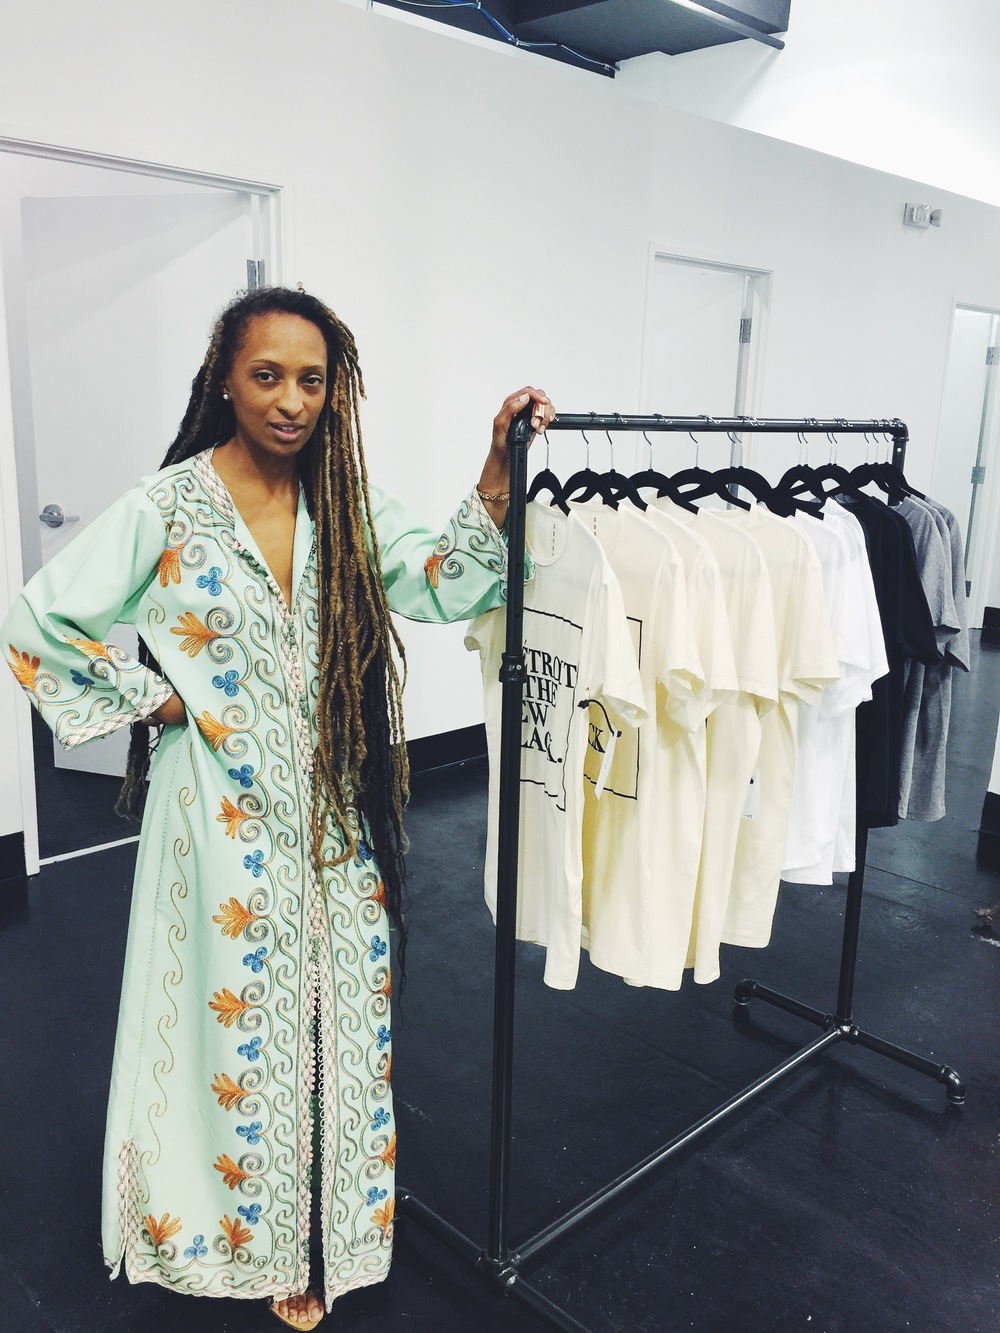 Roslyn Karamoko, founder of Détroit Is The New Black